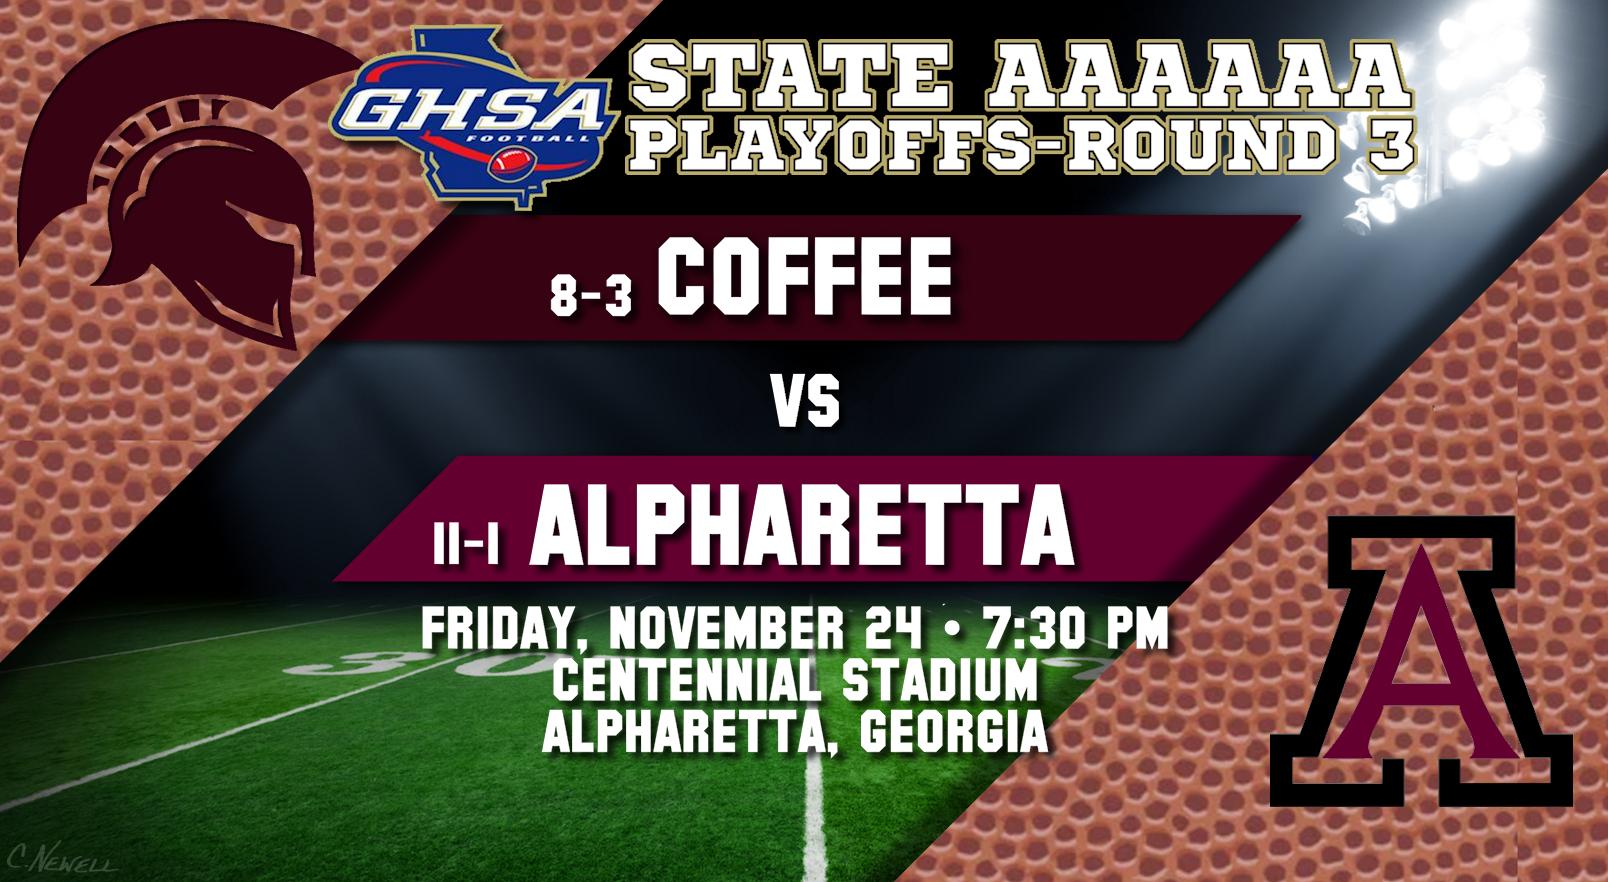 Coffee vs Alpharetta